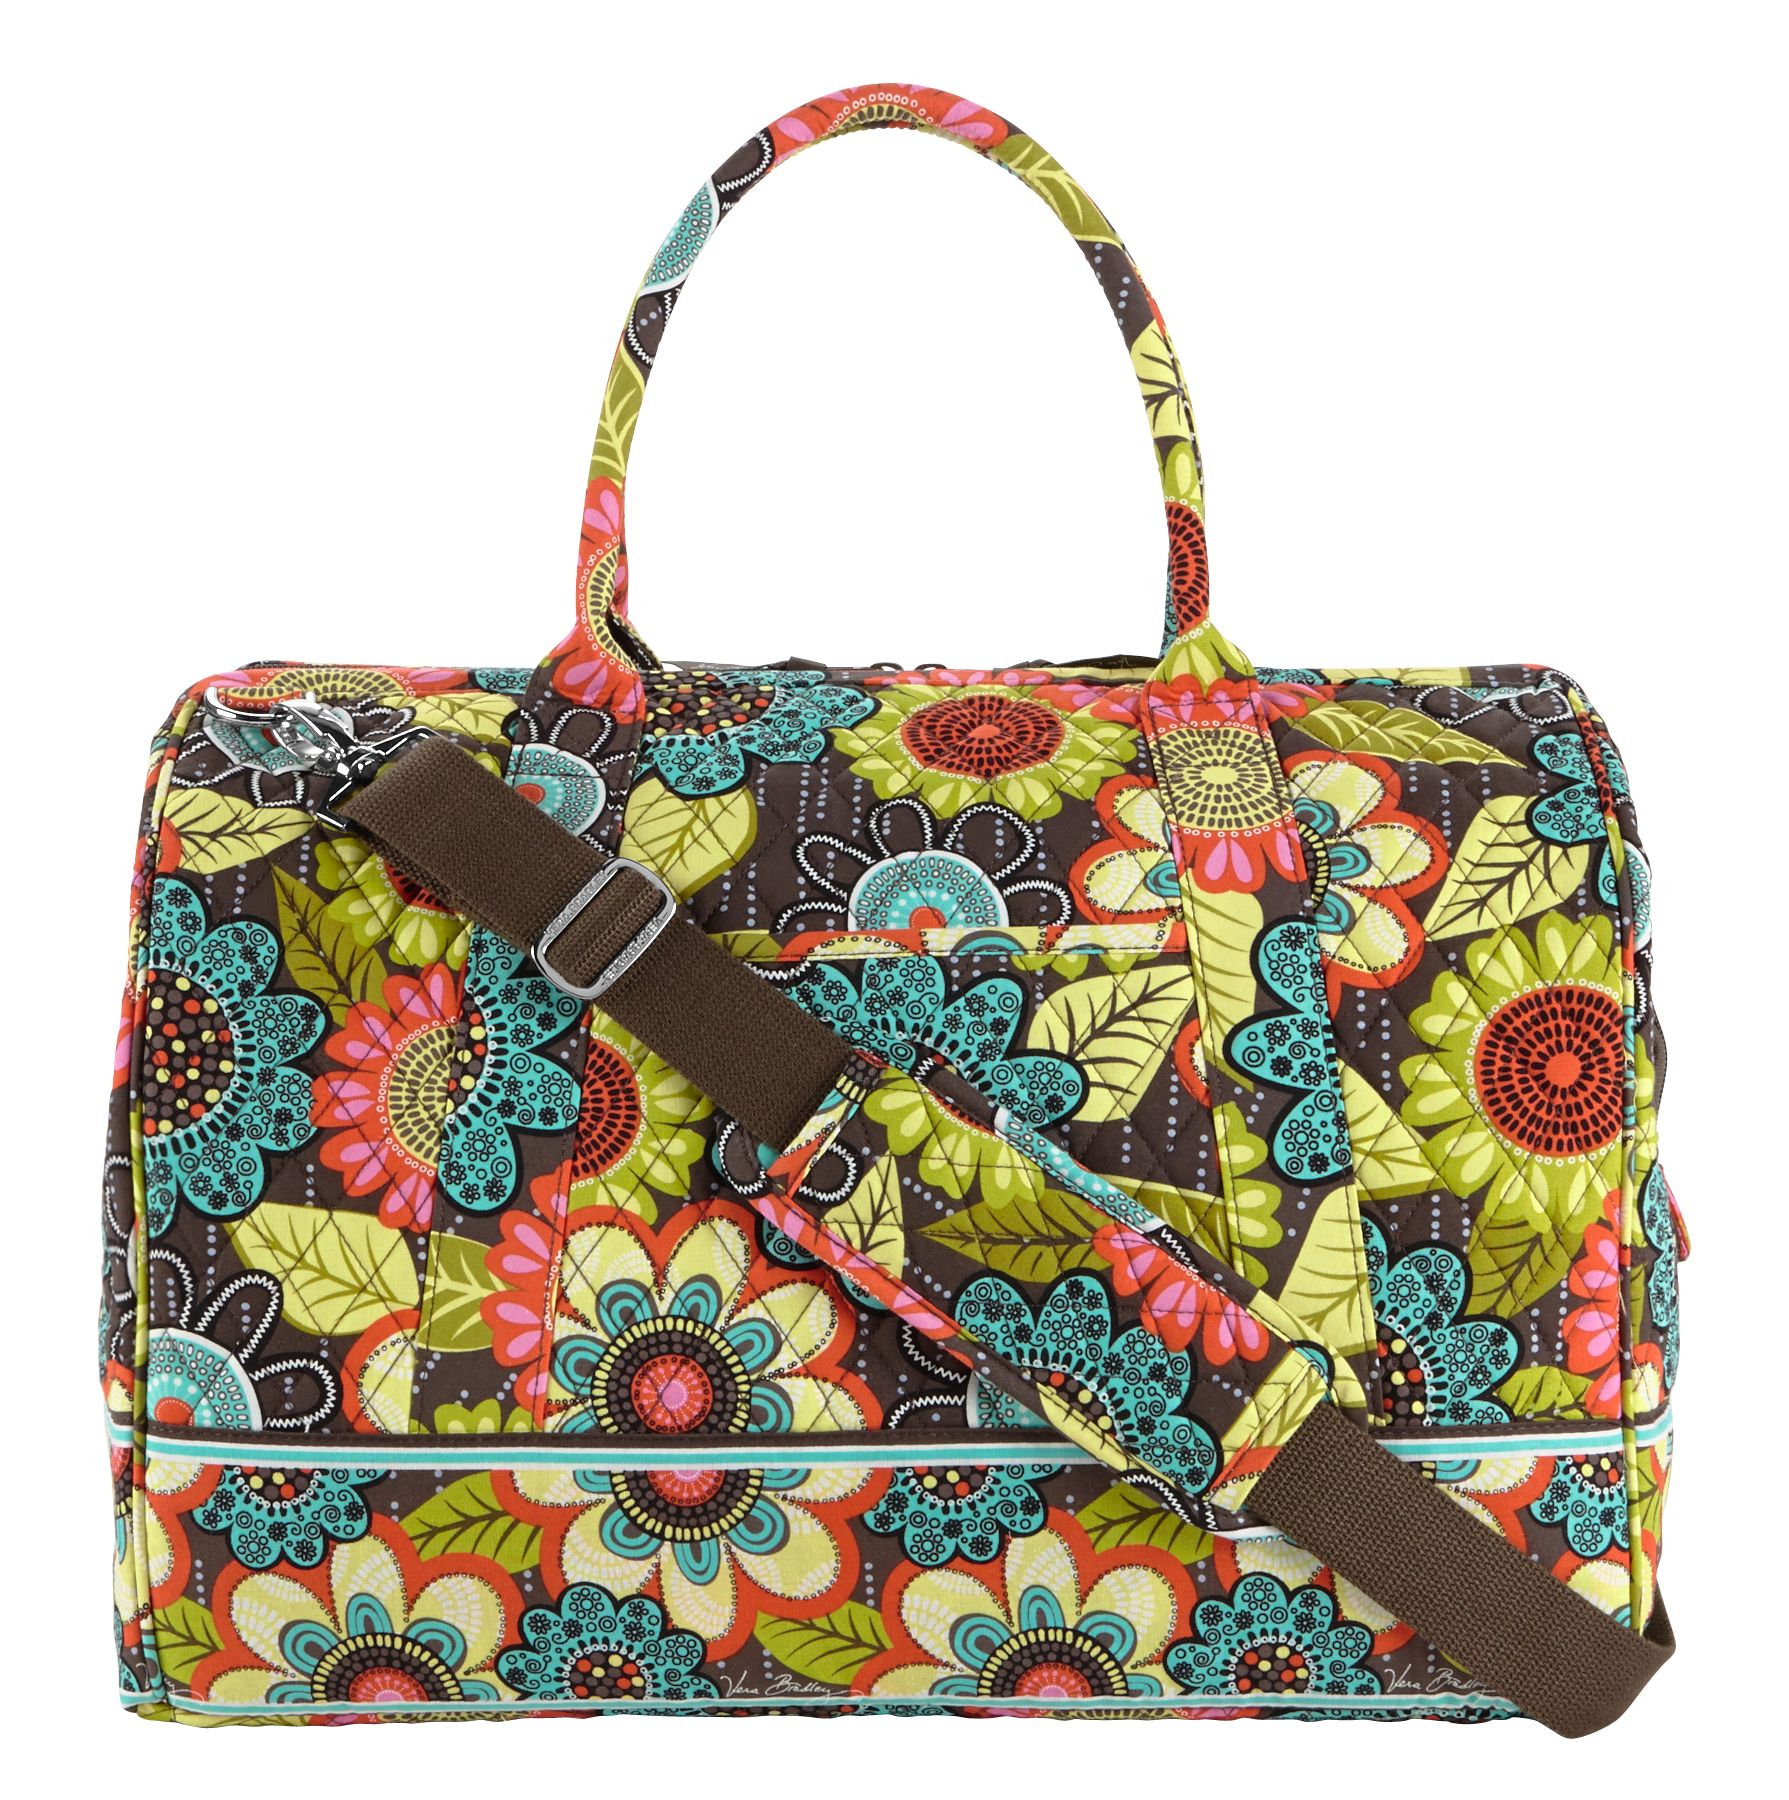 Vera bradley frame travel bag in flower shower sale for Vera bradley bathroom bag